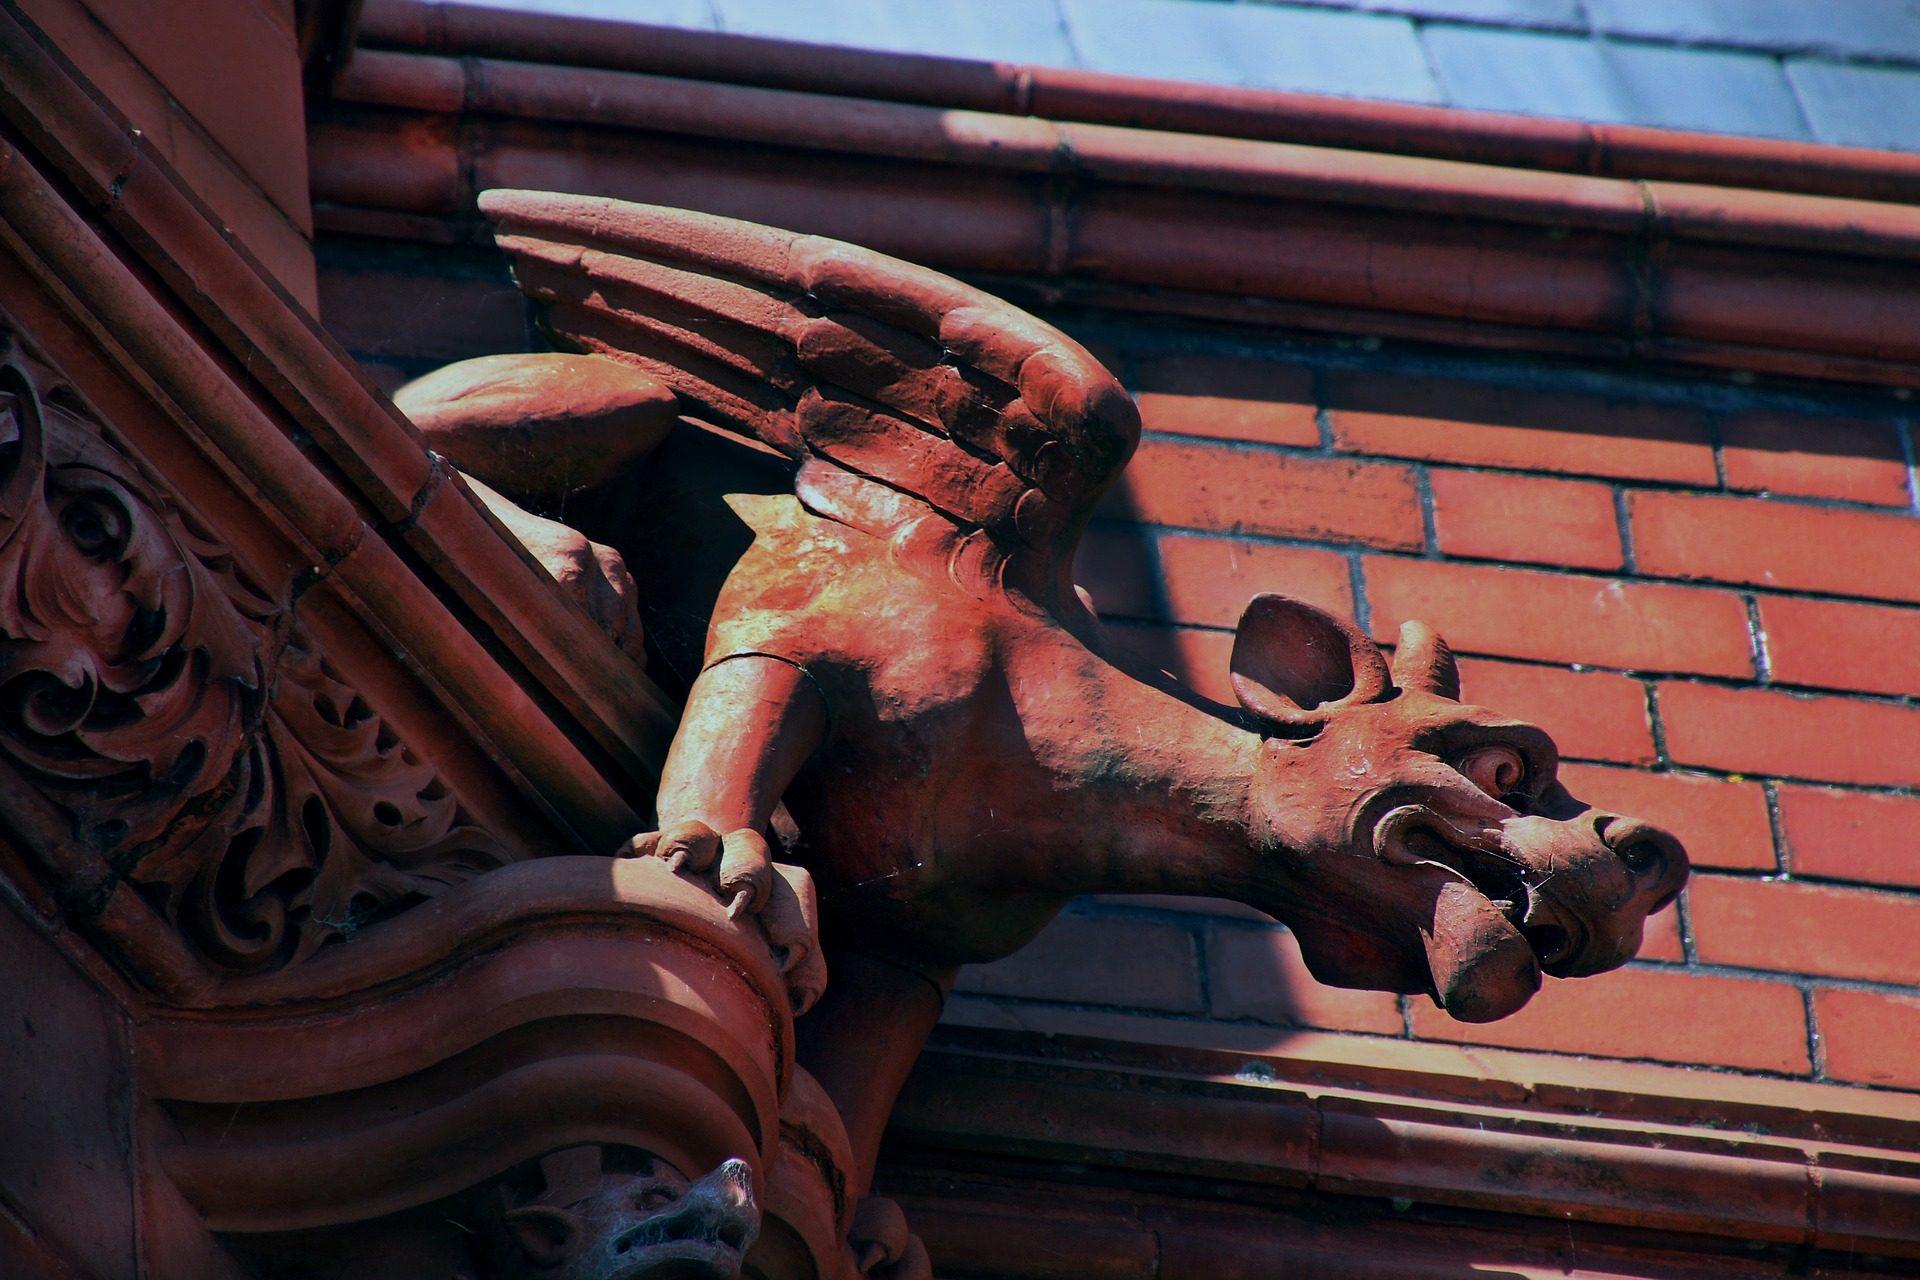 gárgola, estatua, edificio, escultura, alas - Fondos de Pantalla HD - professor-falken.com